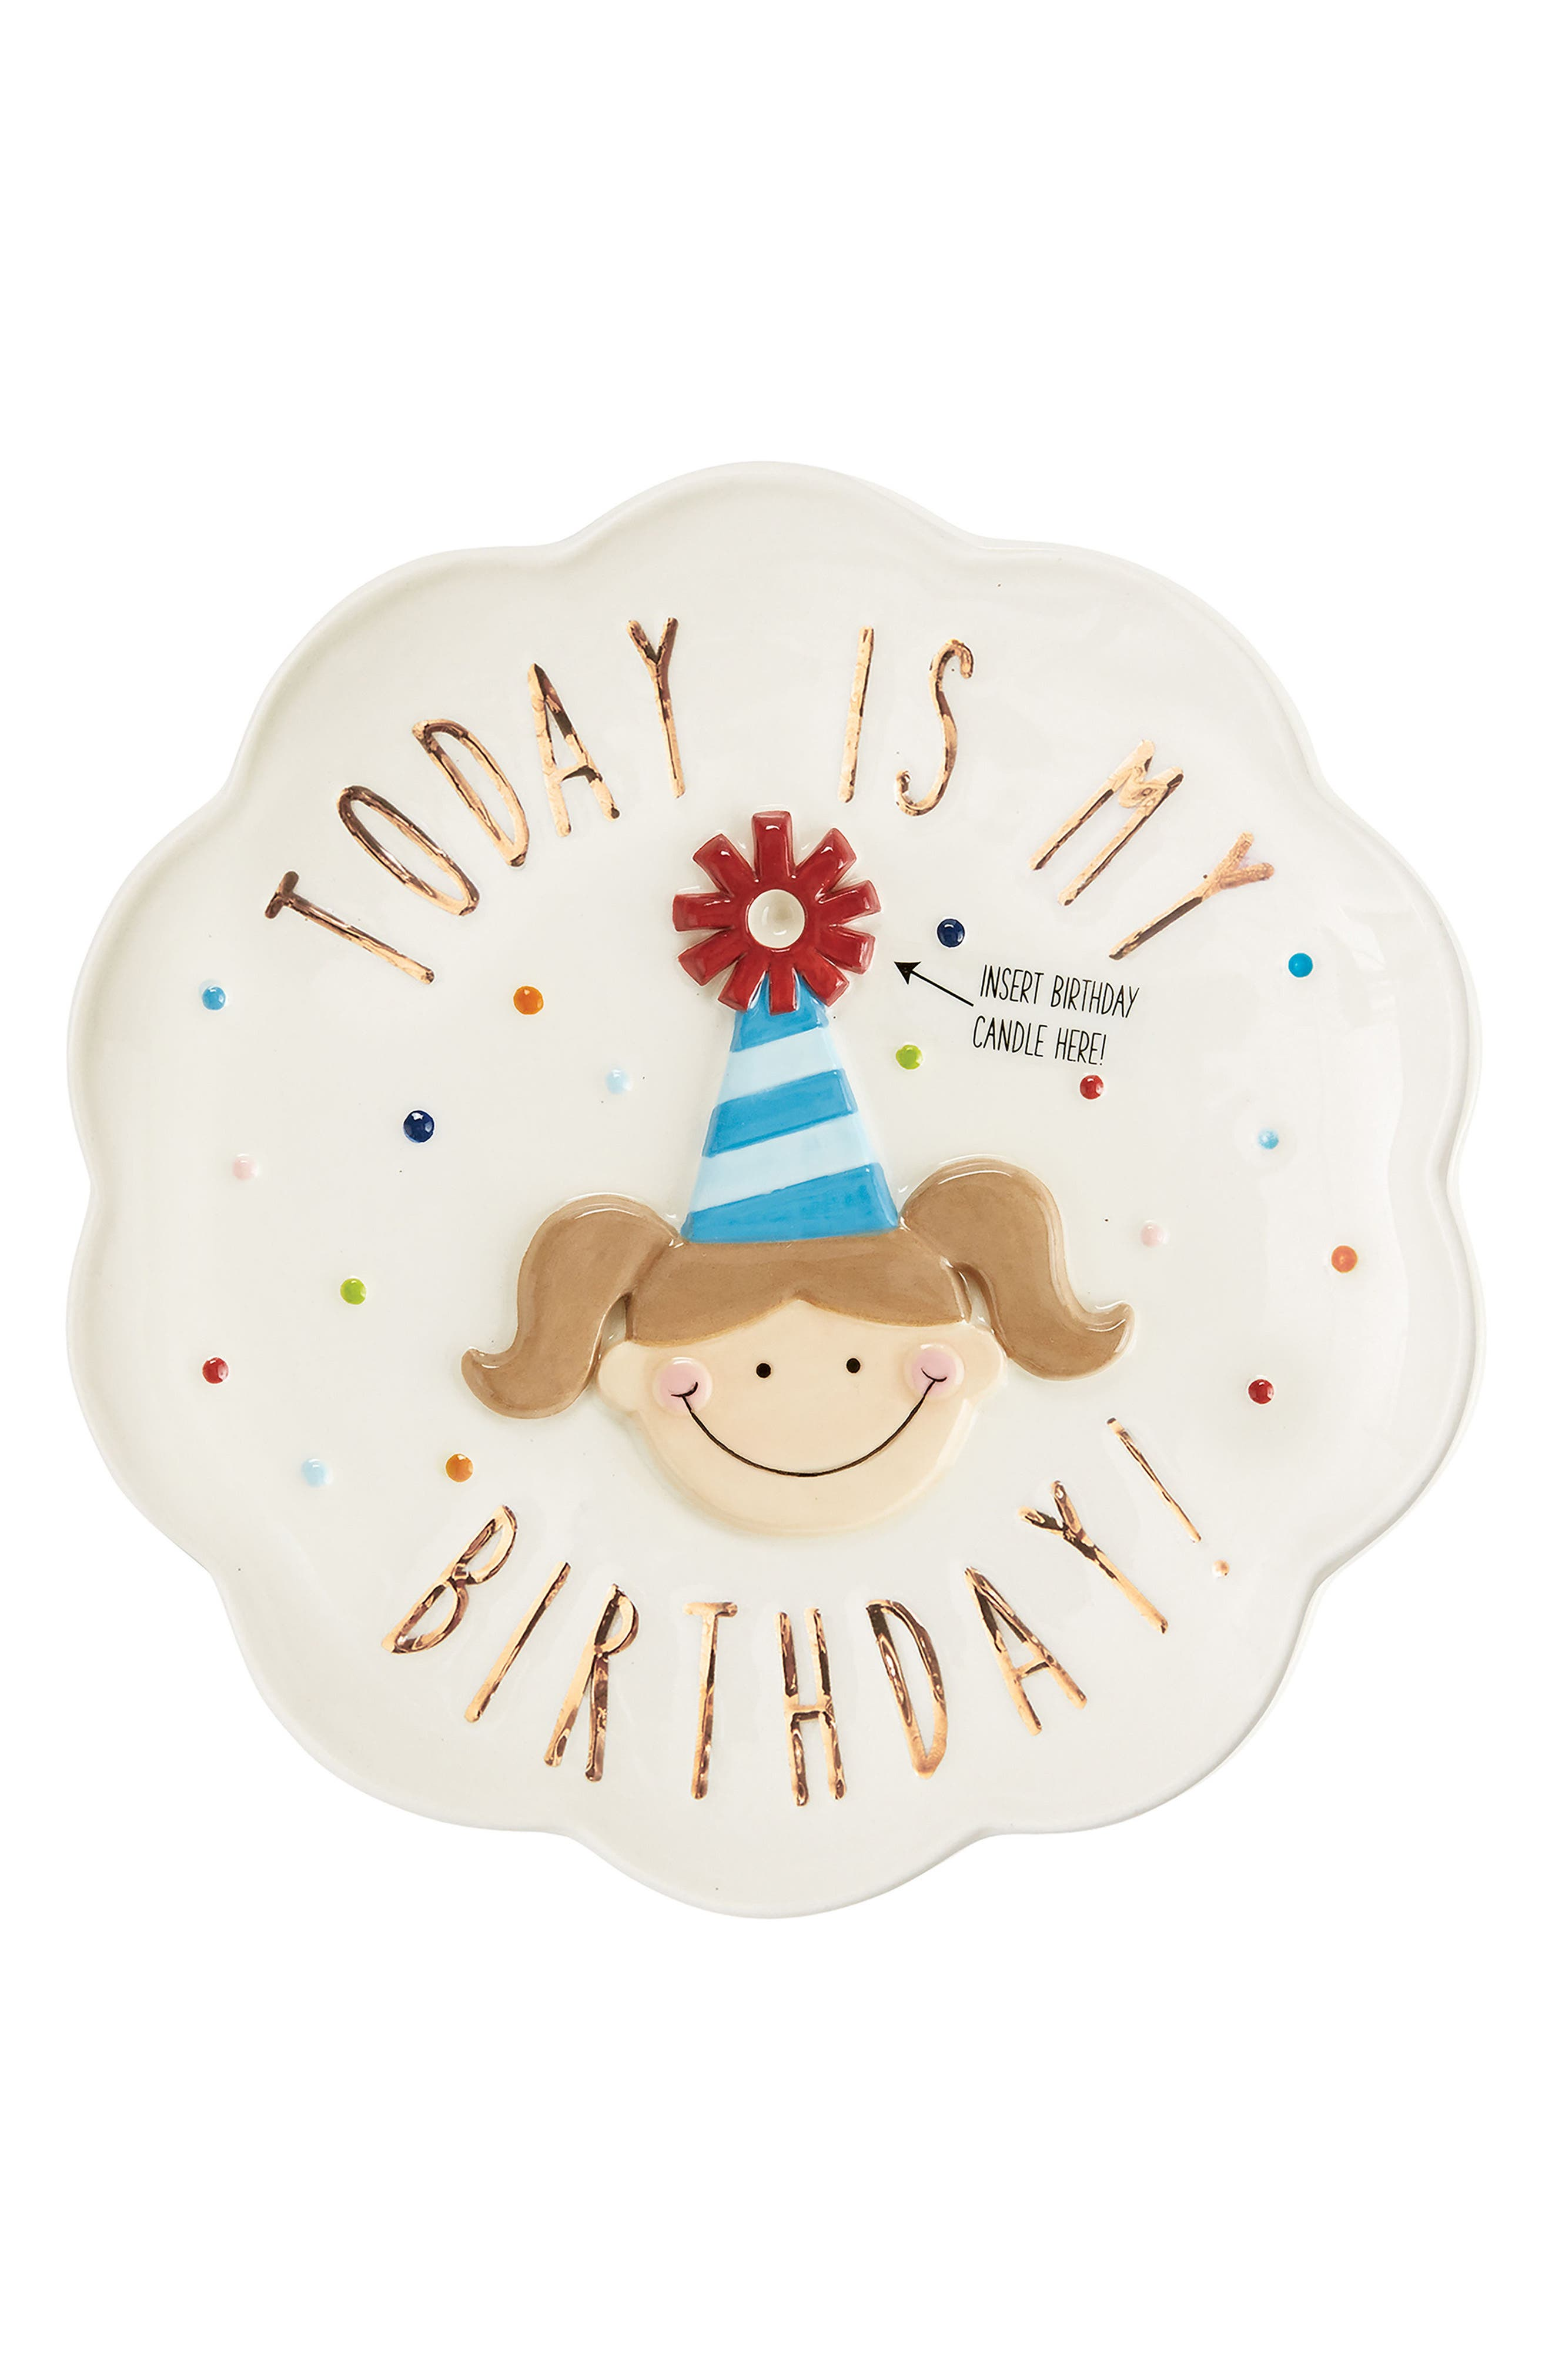 Birthday Girl Candle Plate,                             Main thumbnail 1, color,                             100